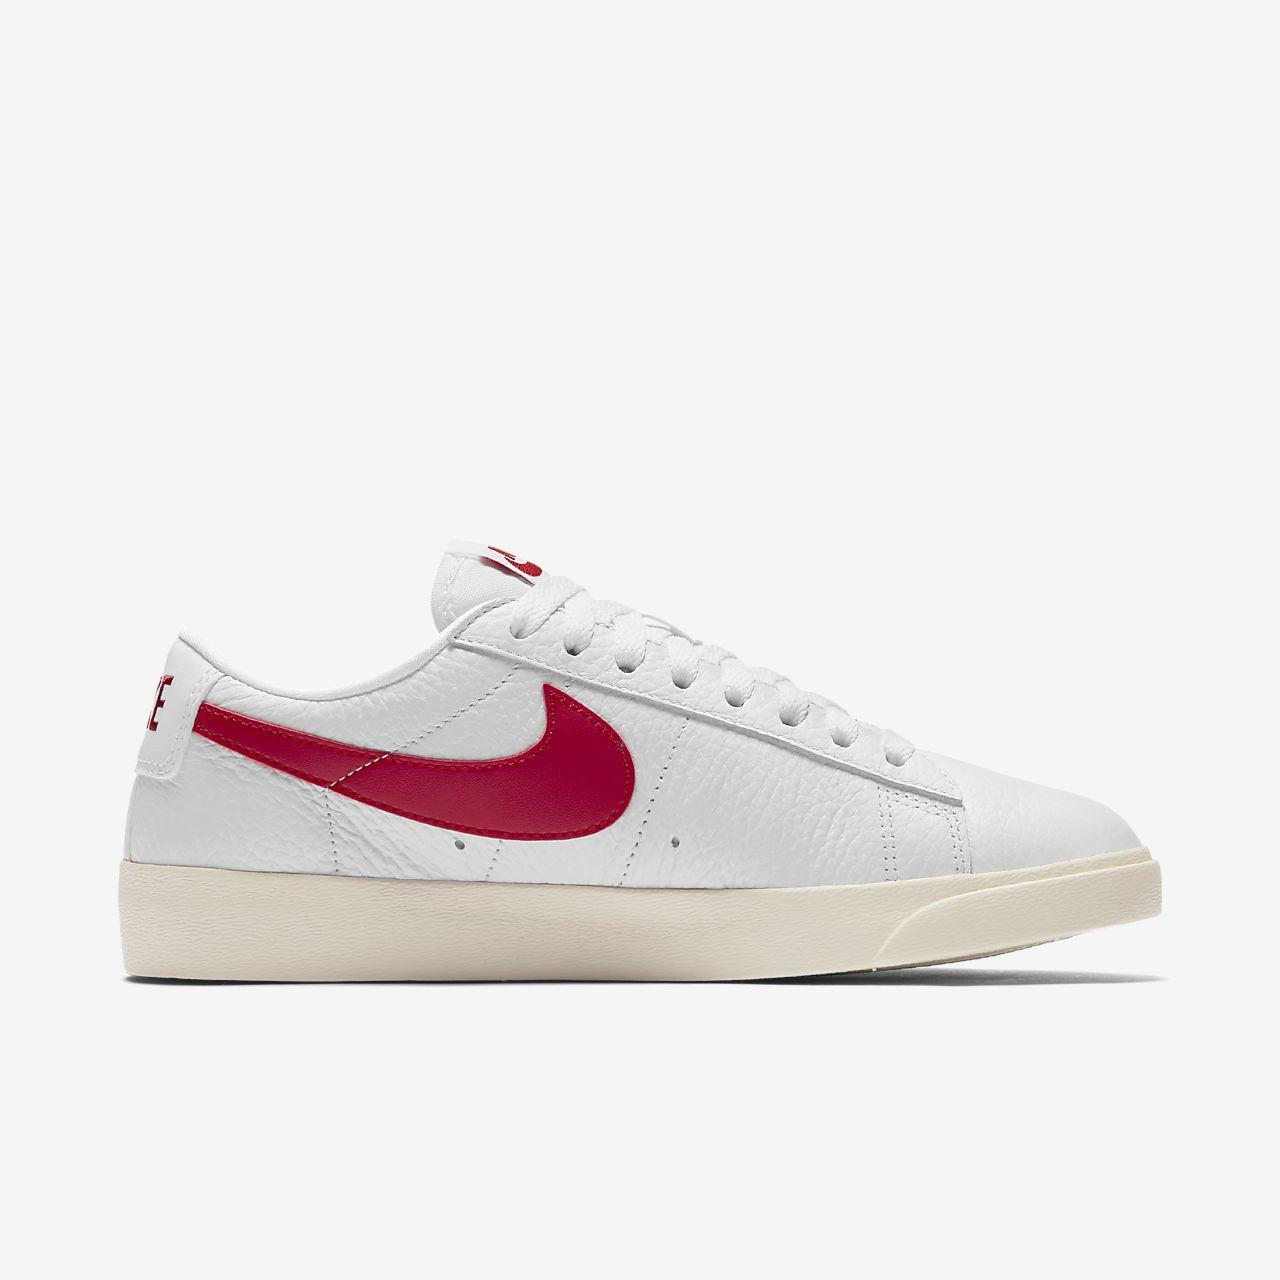 ... Nike Blazer Premium Low Women's Shoe